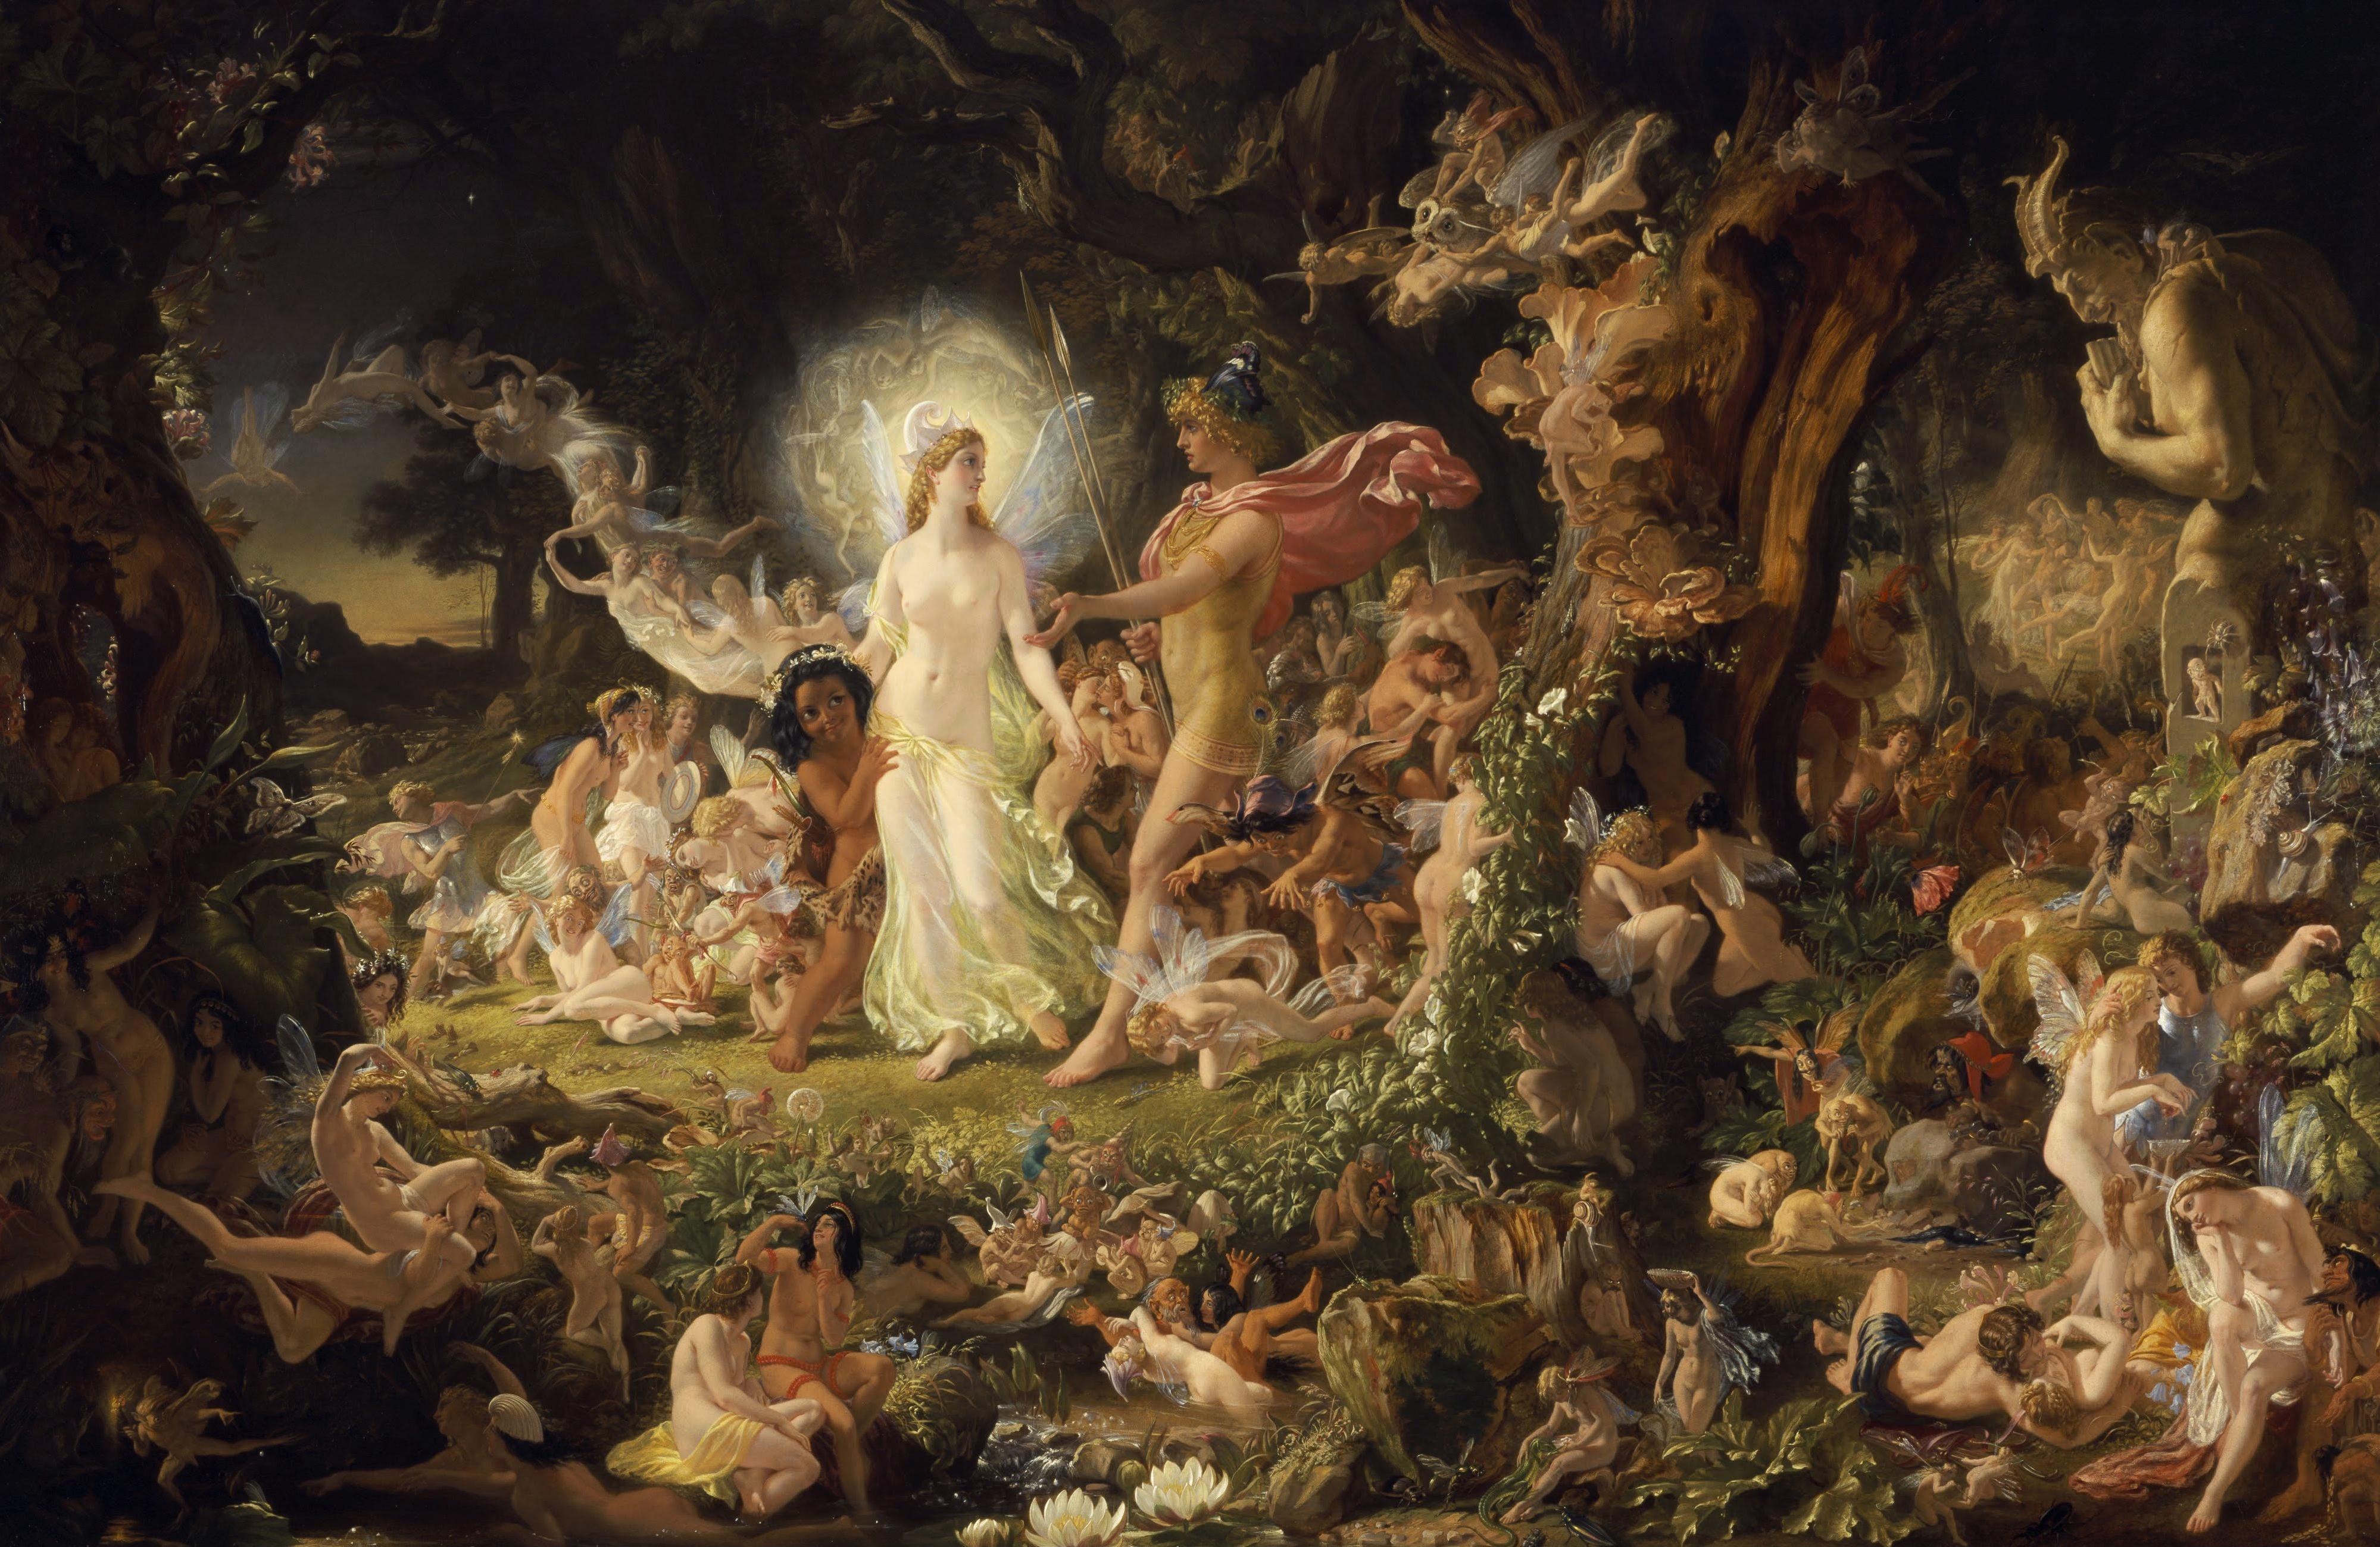 A Midsummer Night's Dream painting